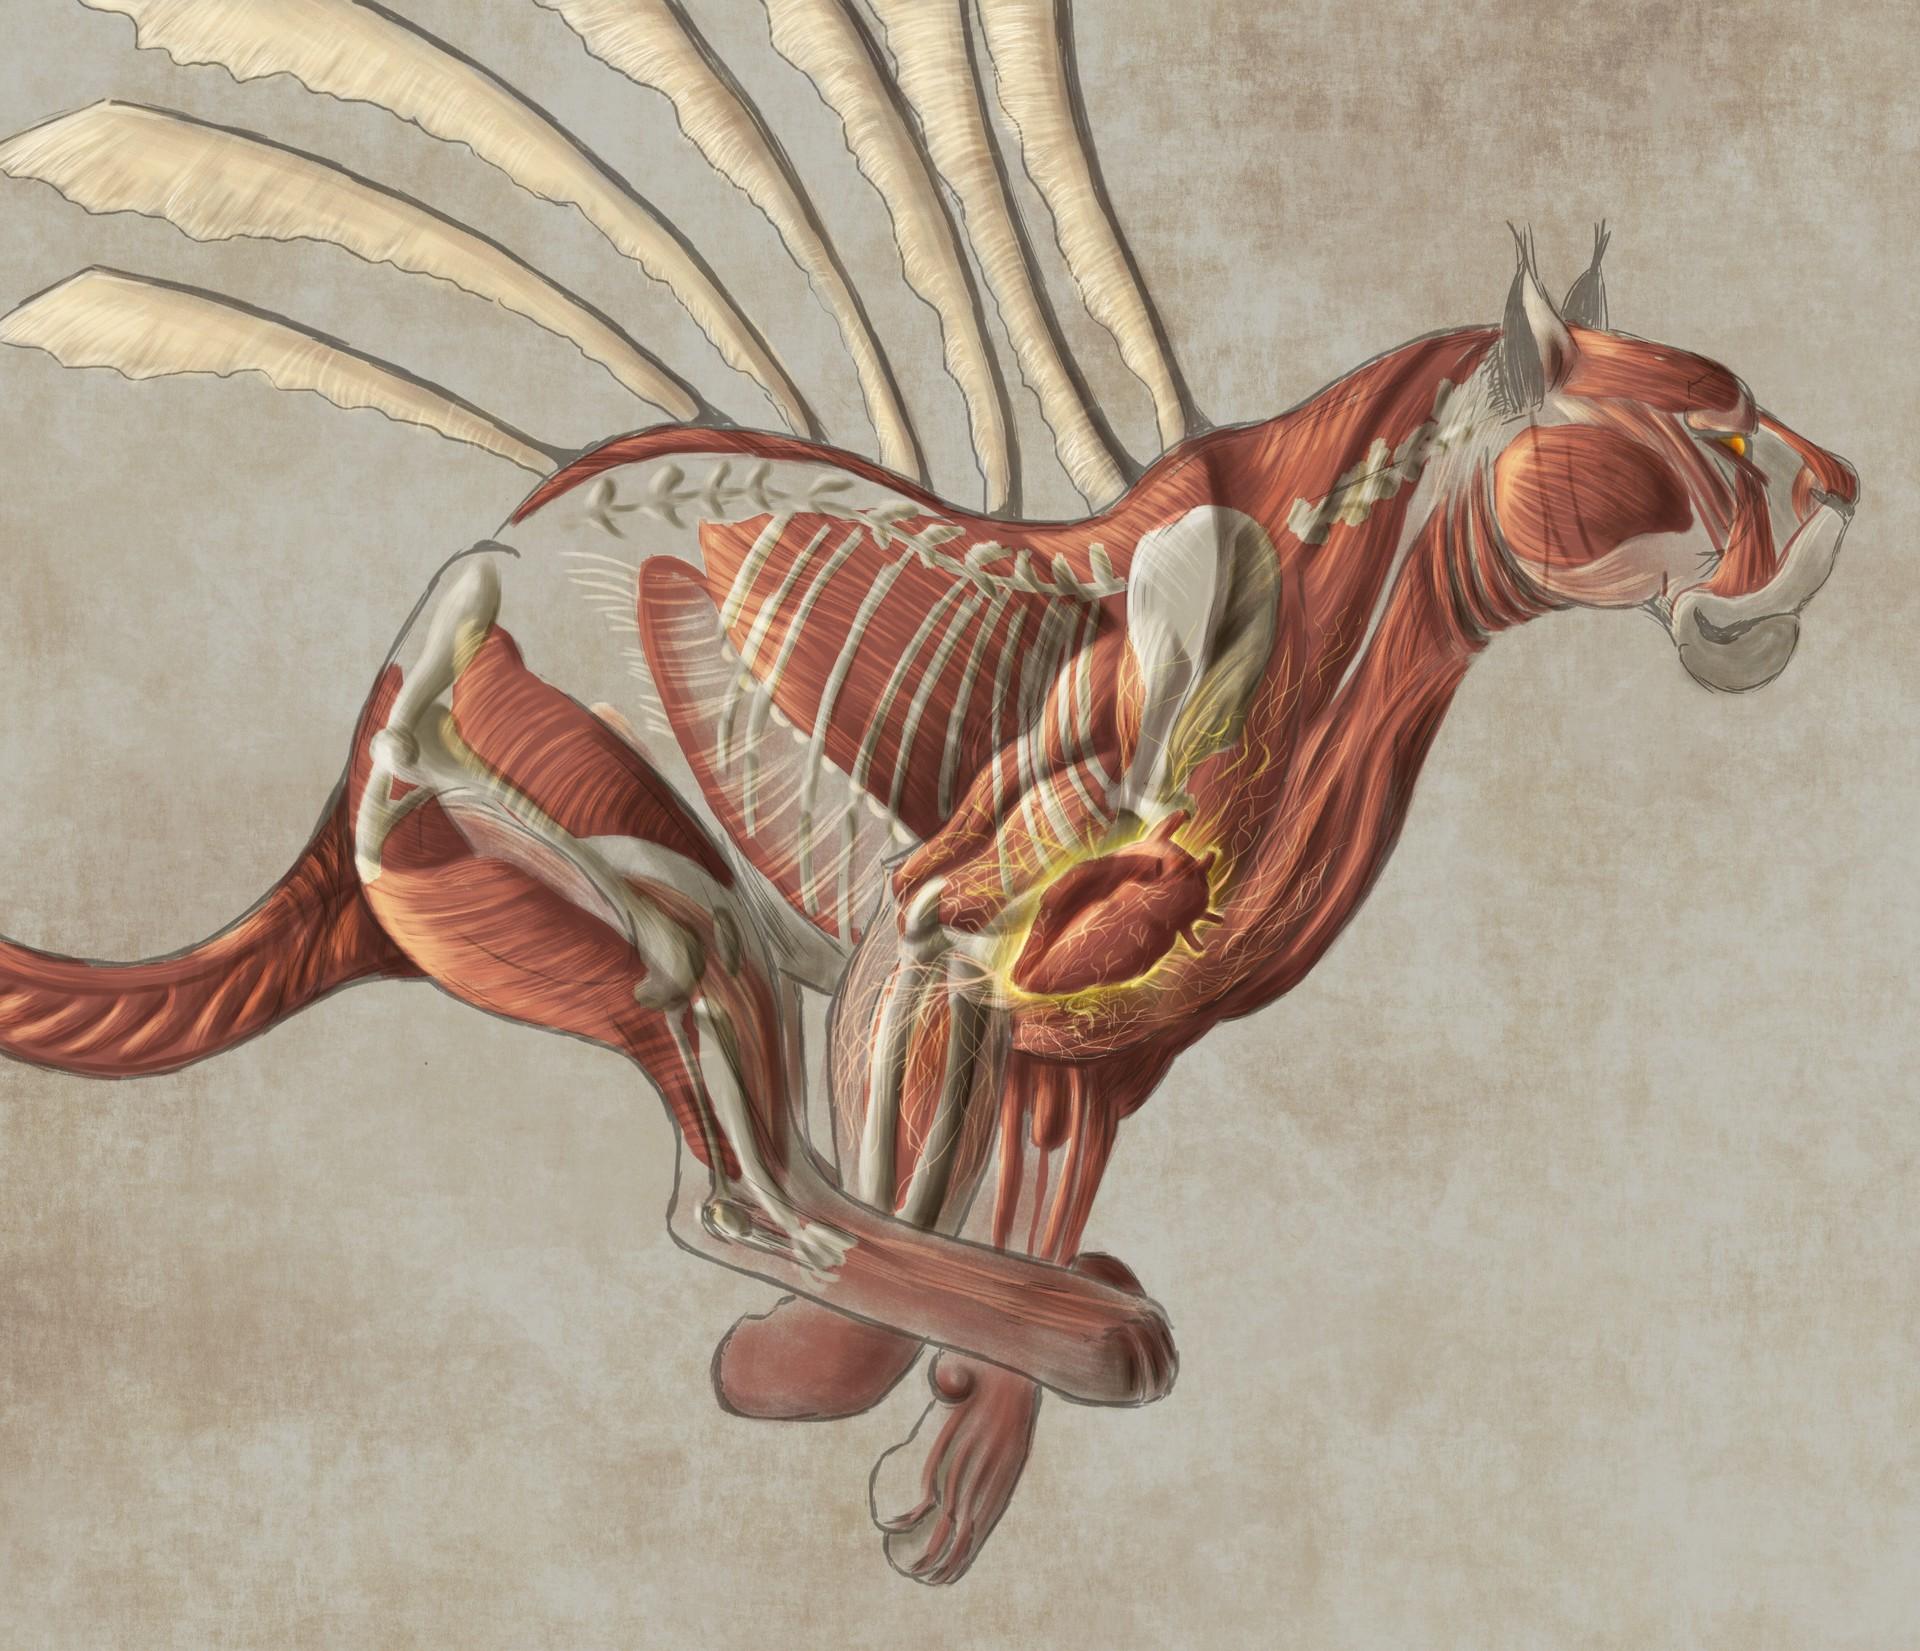 Patrycja Przełucka - The Muscle Study of a Fantastic Lion